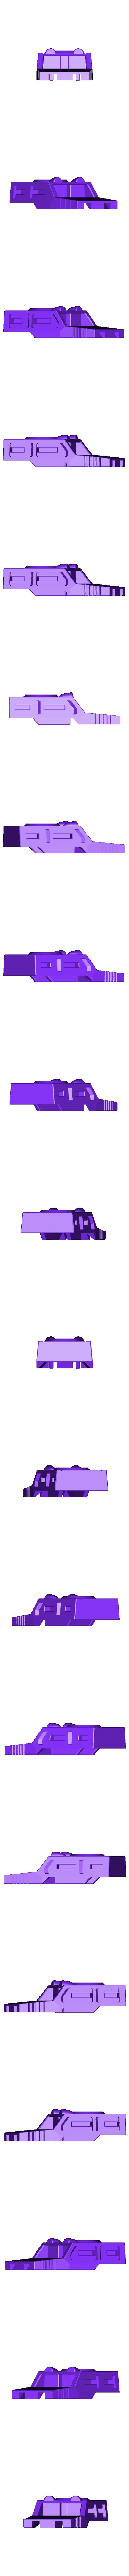 6_Brawn_Backpack1_Main_GREEN.stl Download free STL file G1 Transformers Brawn • 3D printer object, Toymakr3D